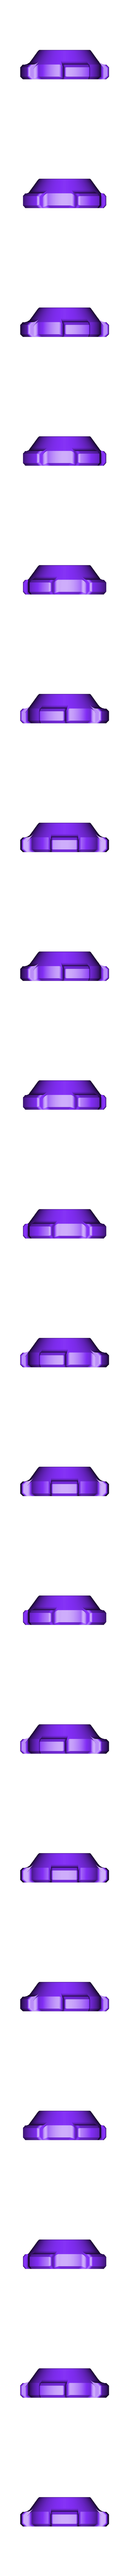 AnetE10_Xtensioner_Knob.STL Download free STL file Anet E10: X belt tensioner • 3D printable object, MrCrankyface